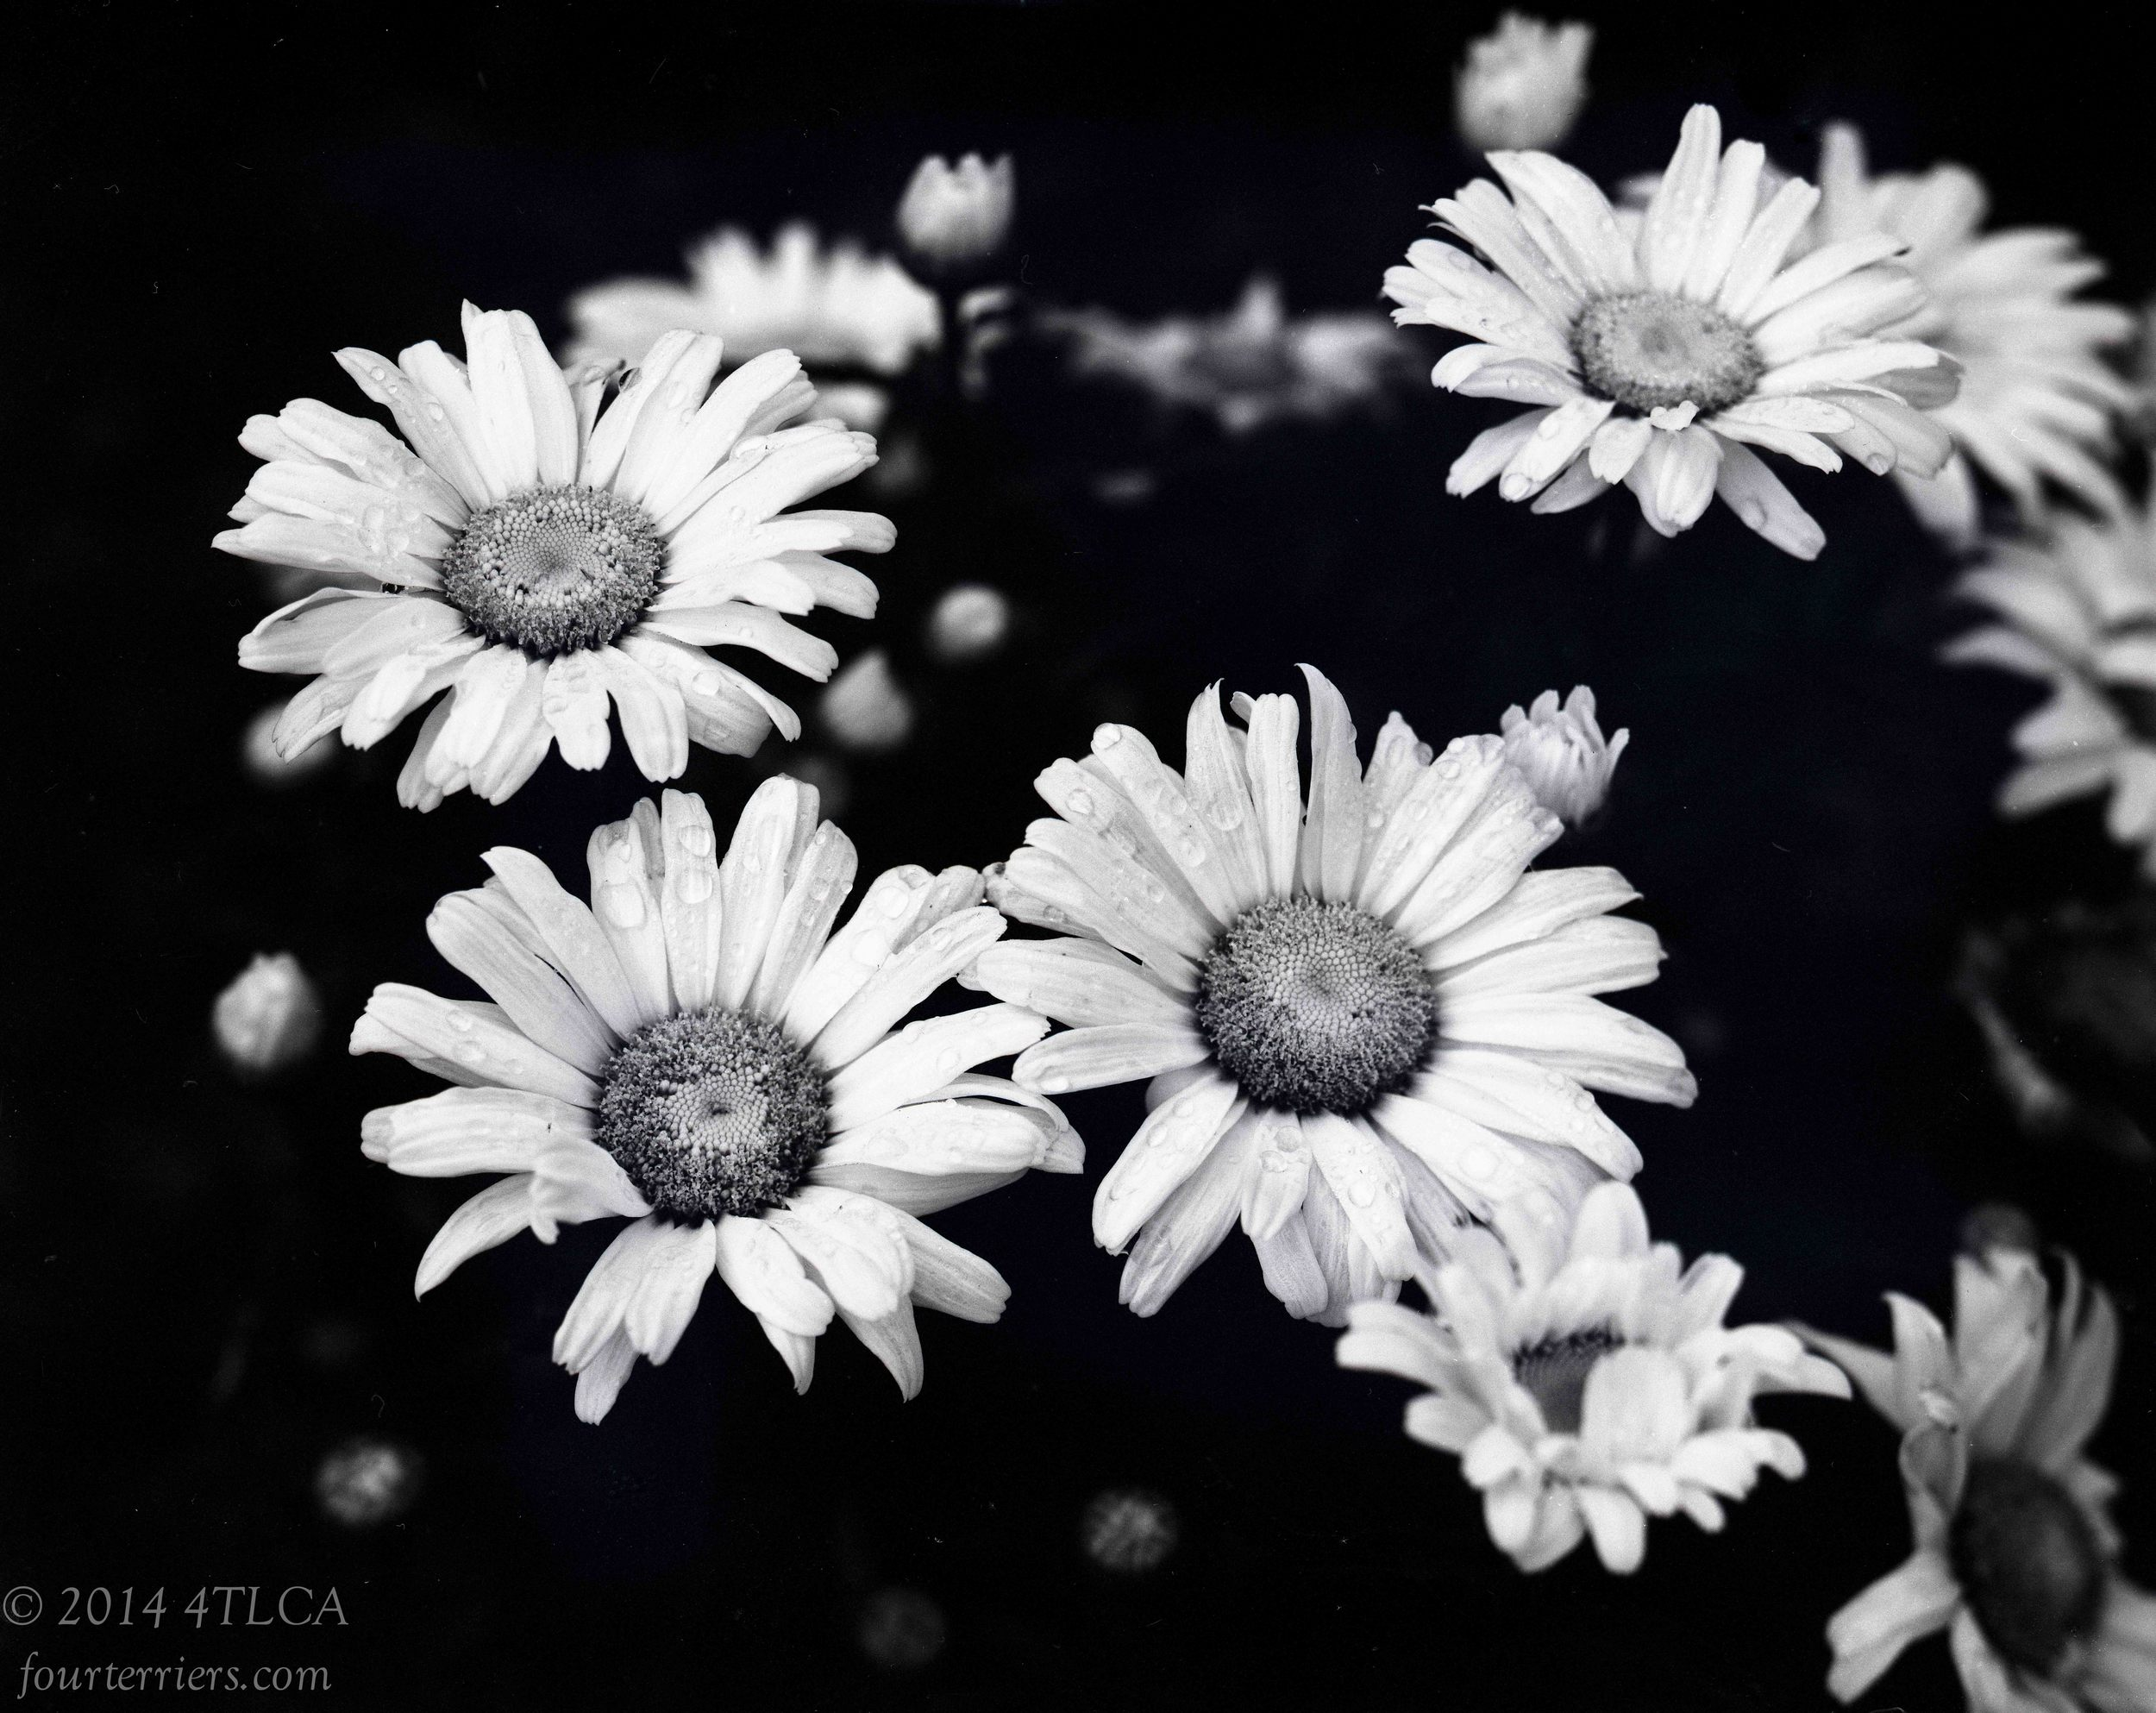 Daisies in Monochrome